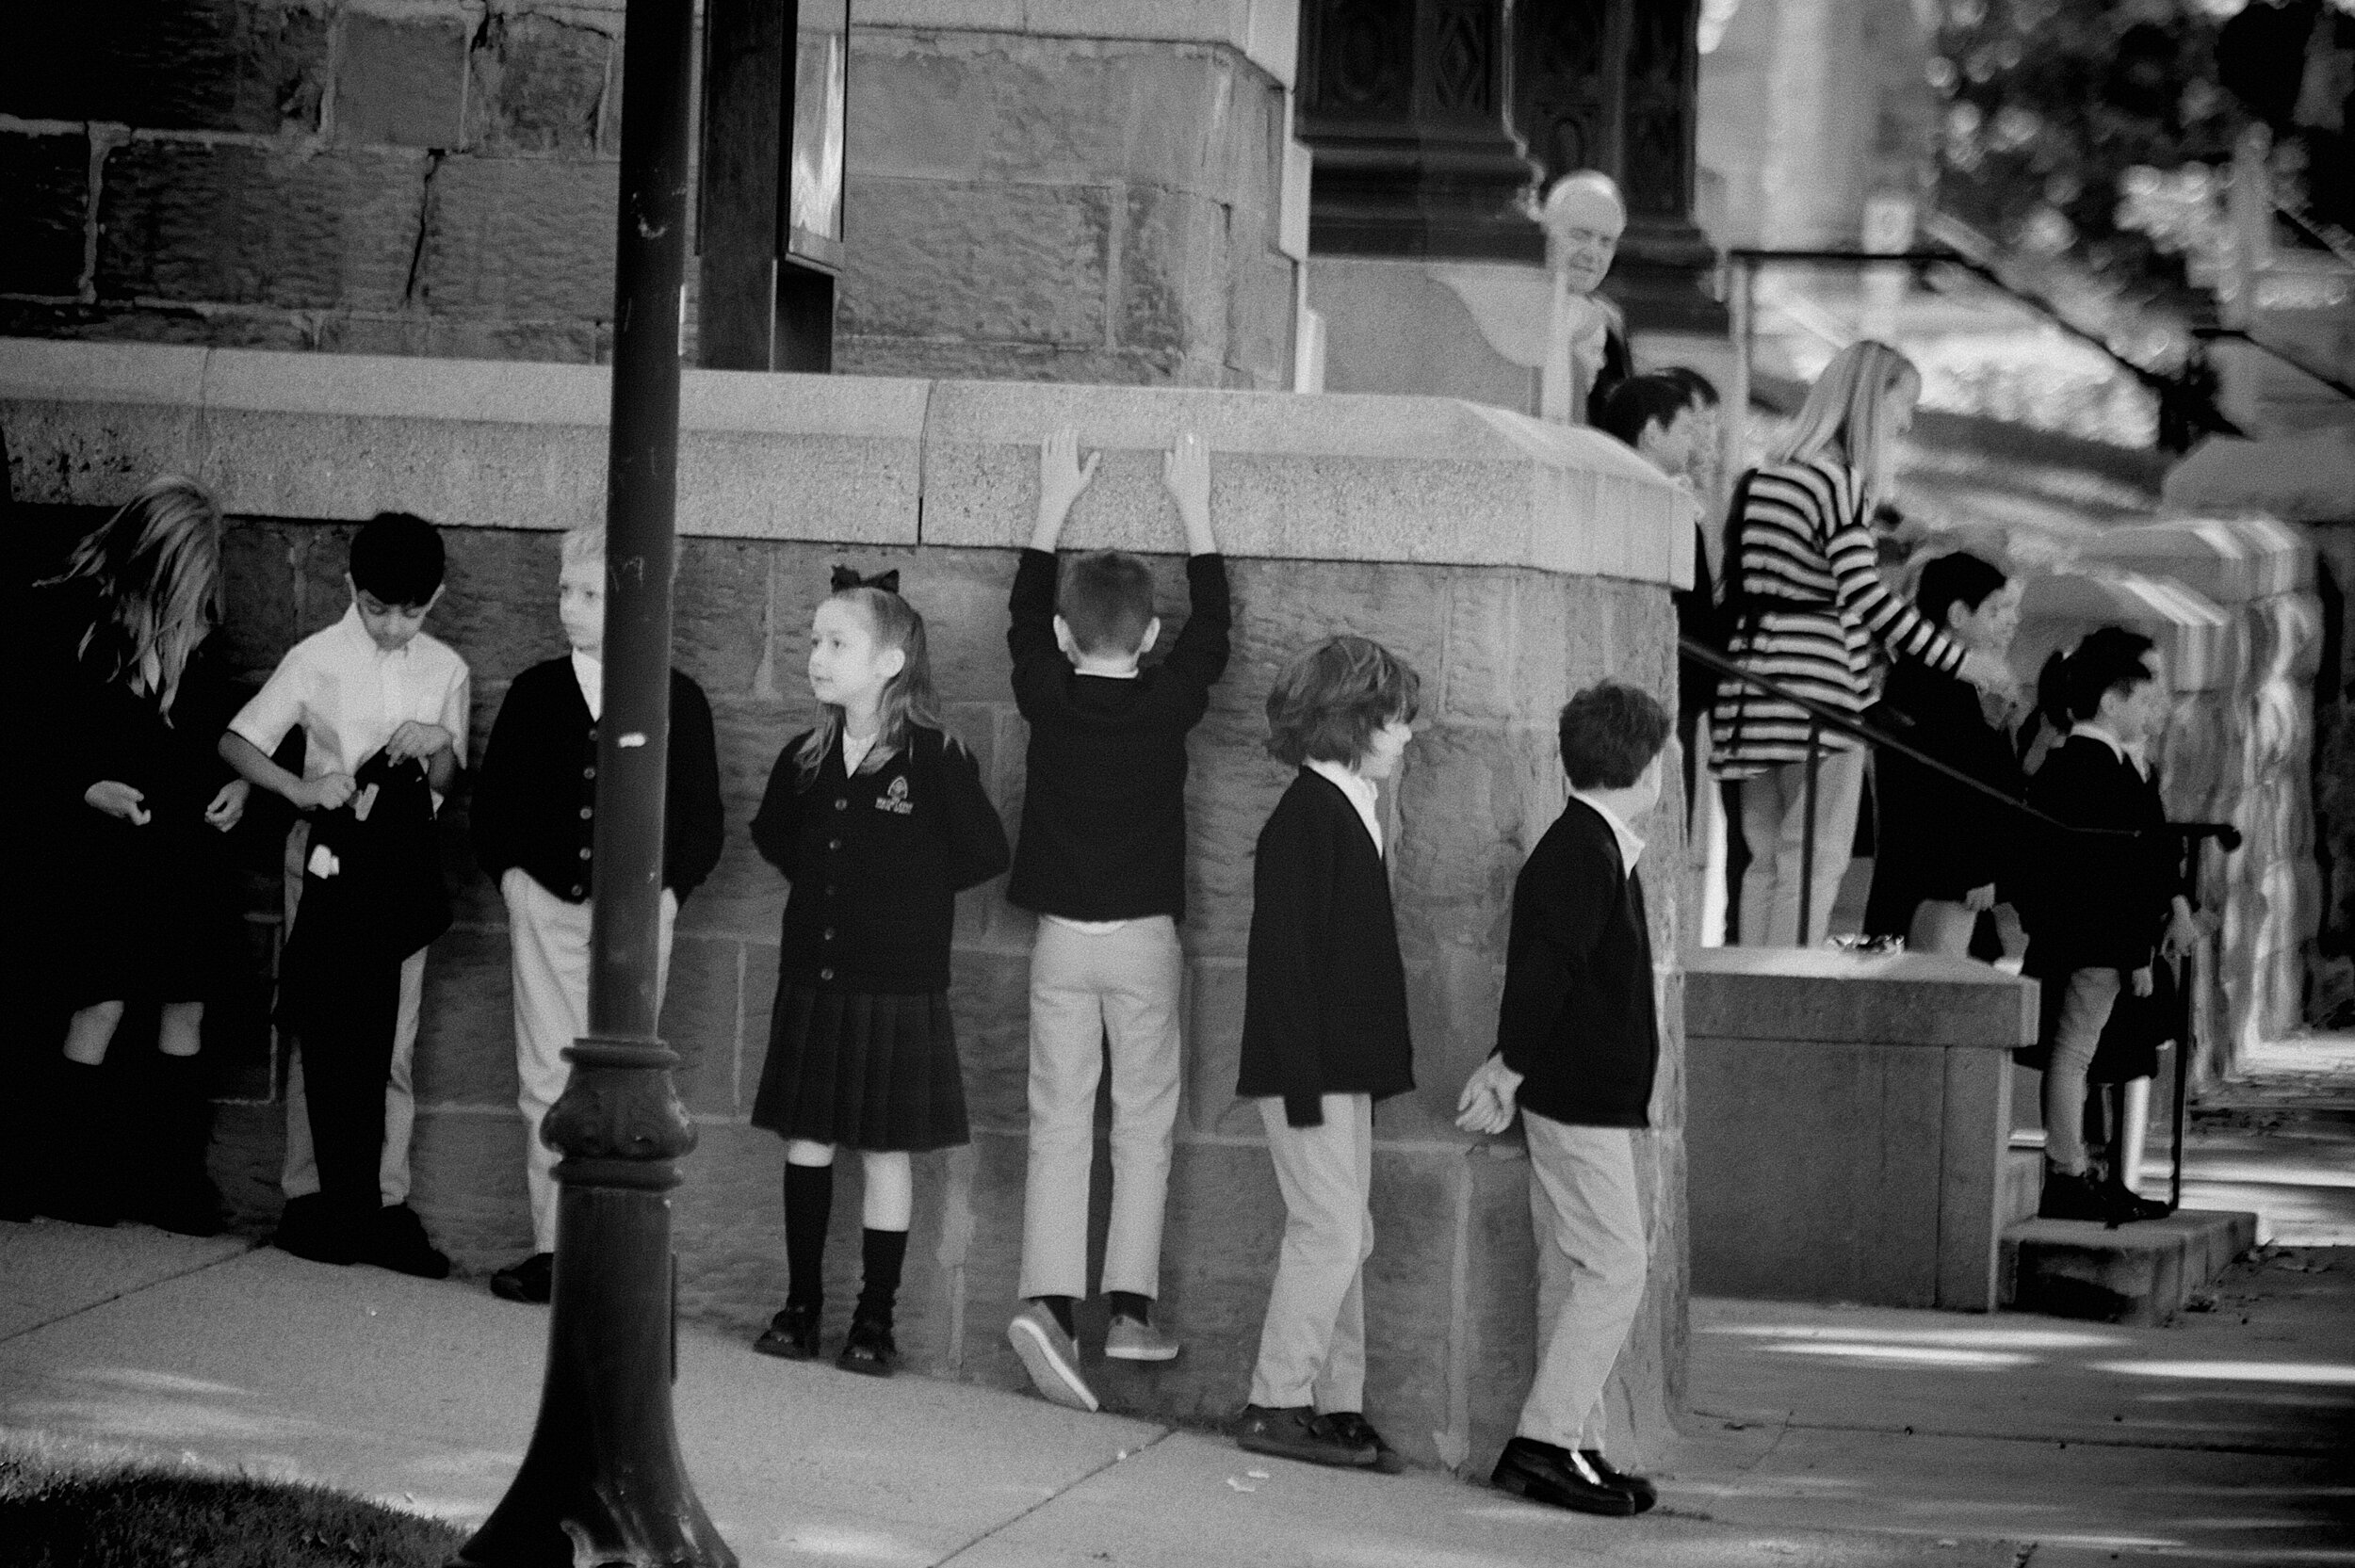 School Pictures. Salt Lake City, Utah. September 2019. ©William D. Walker